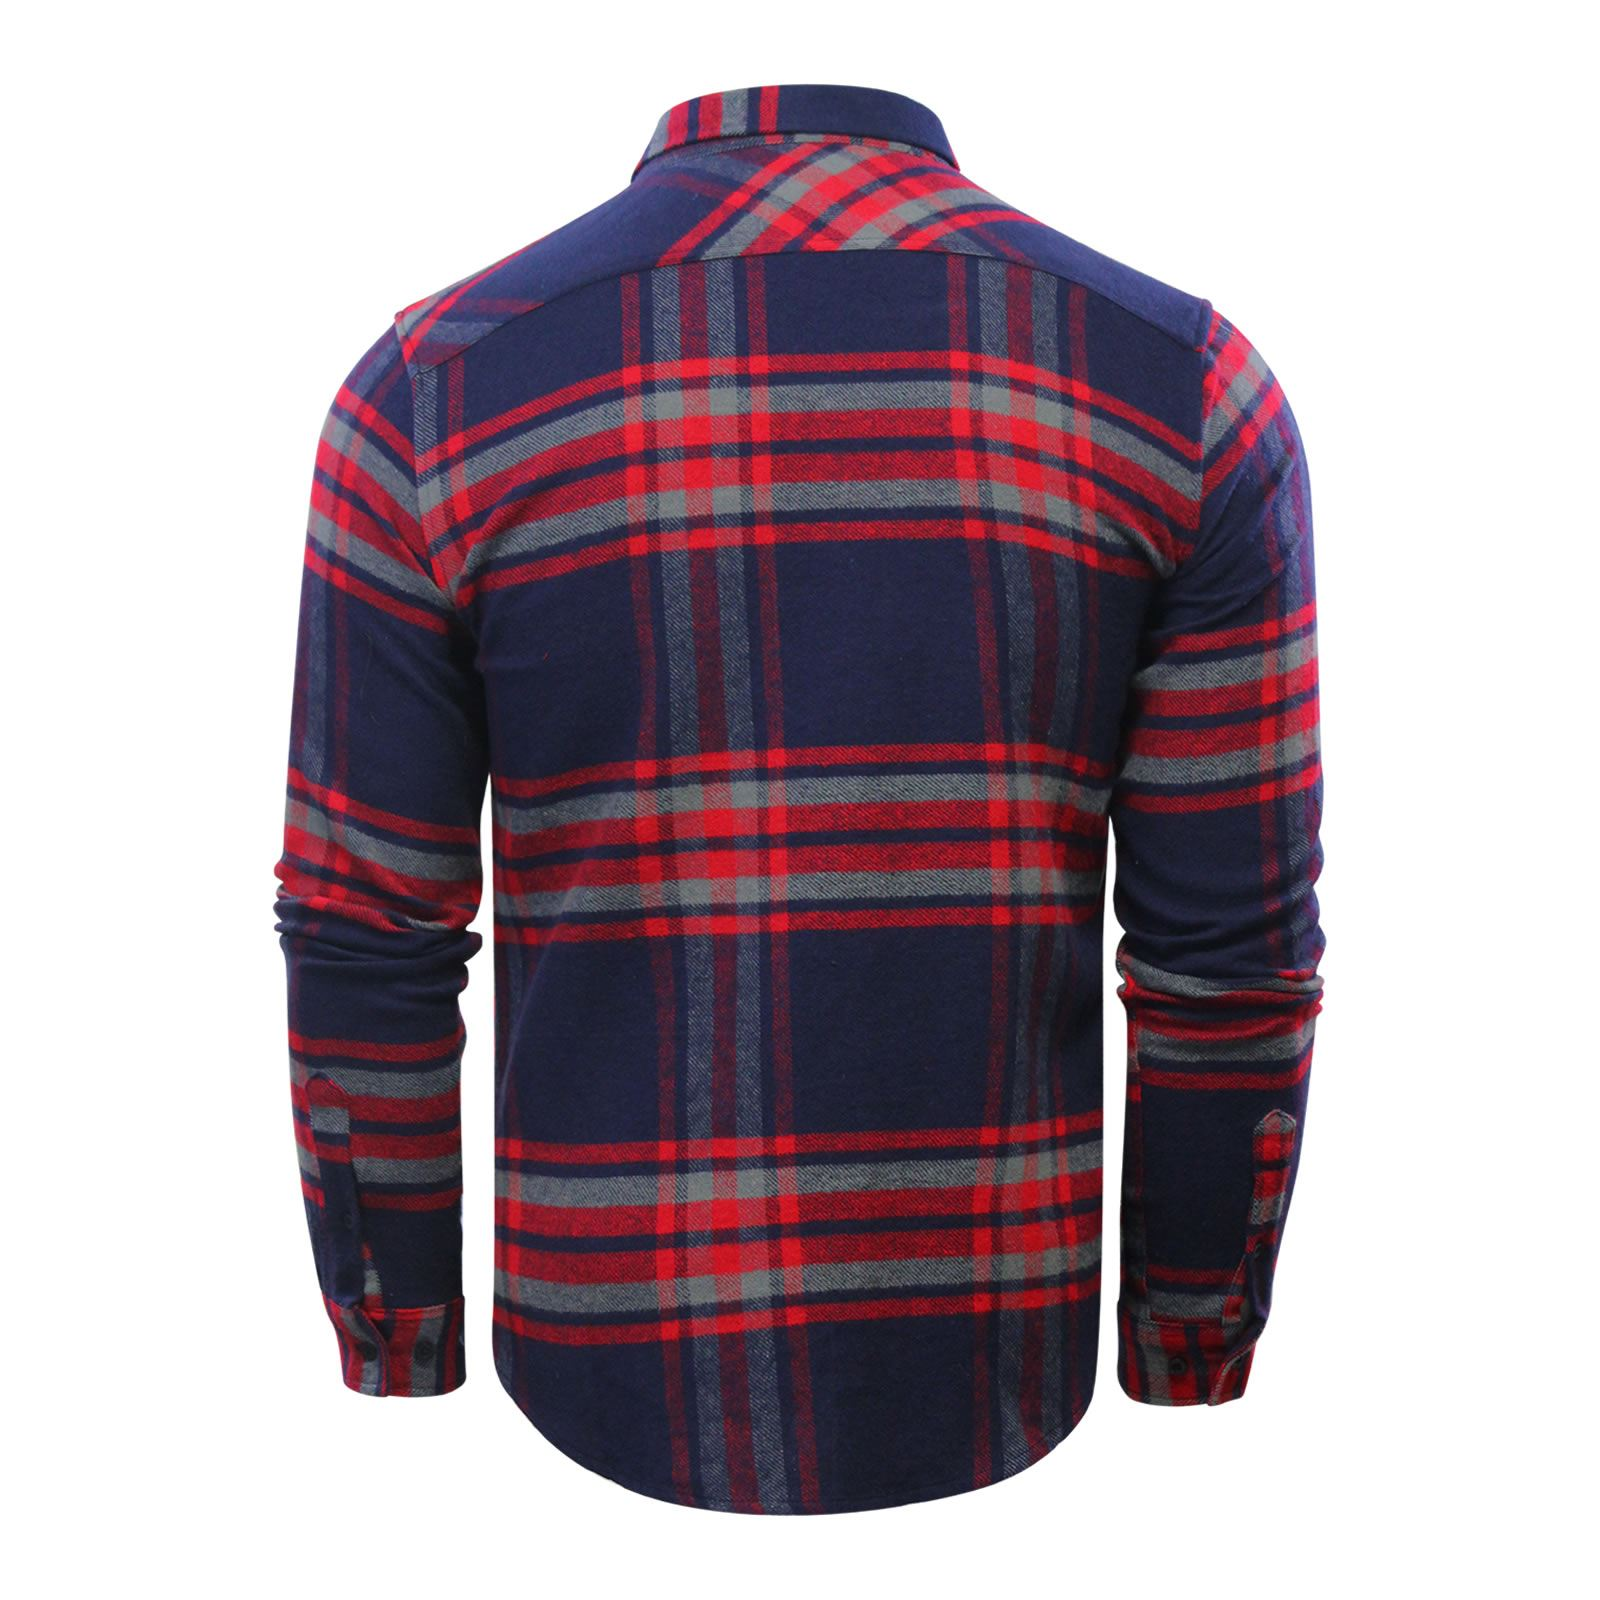 Crosshatch-Fitzroya-Mens-Check-Shirt-Flannel-Brushed-Cotton-Long-Sleeve miniature 5